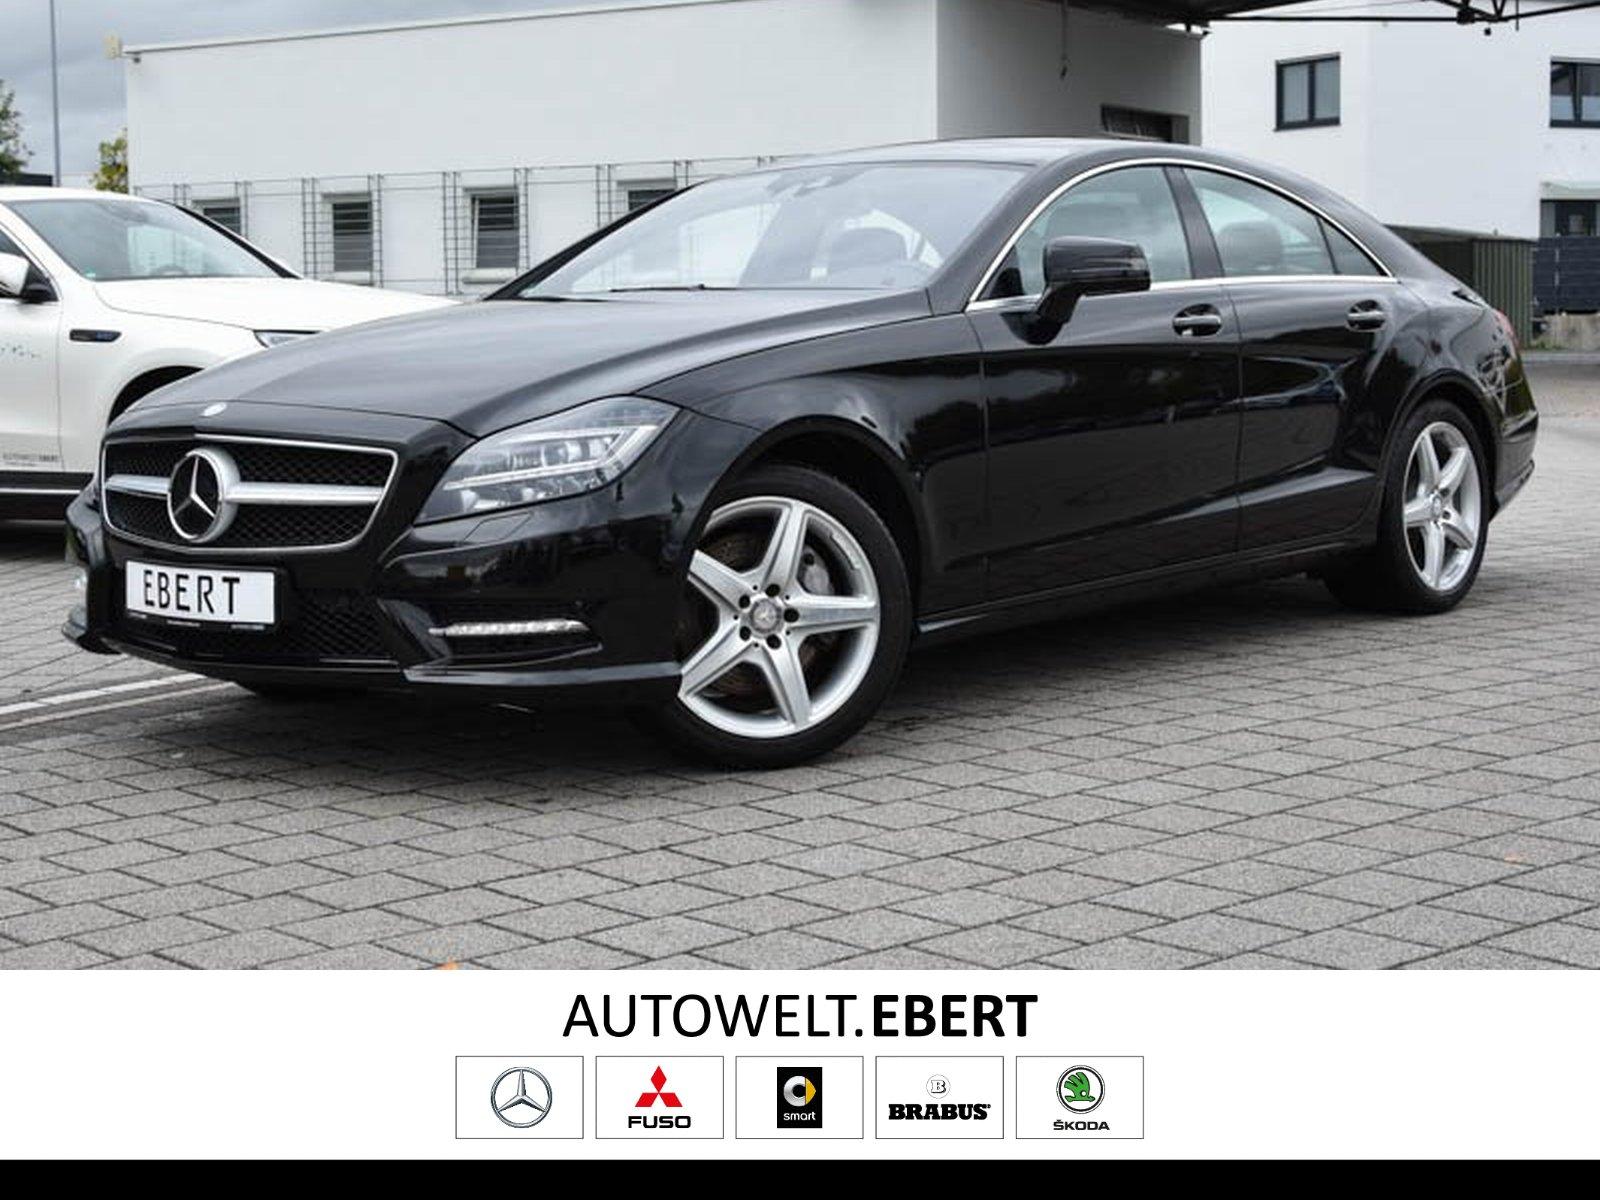 Mercedes-Benz CLS 350 BT AMG AIRMATIC+STDHZG+COMAND+DISTR+EU6, Jahr 2014, Diesel